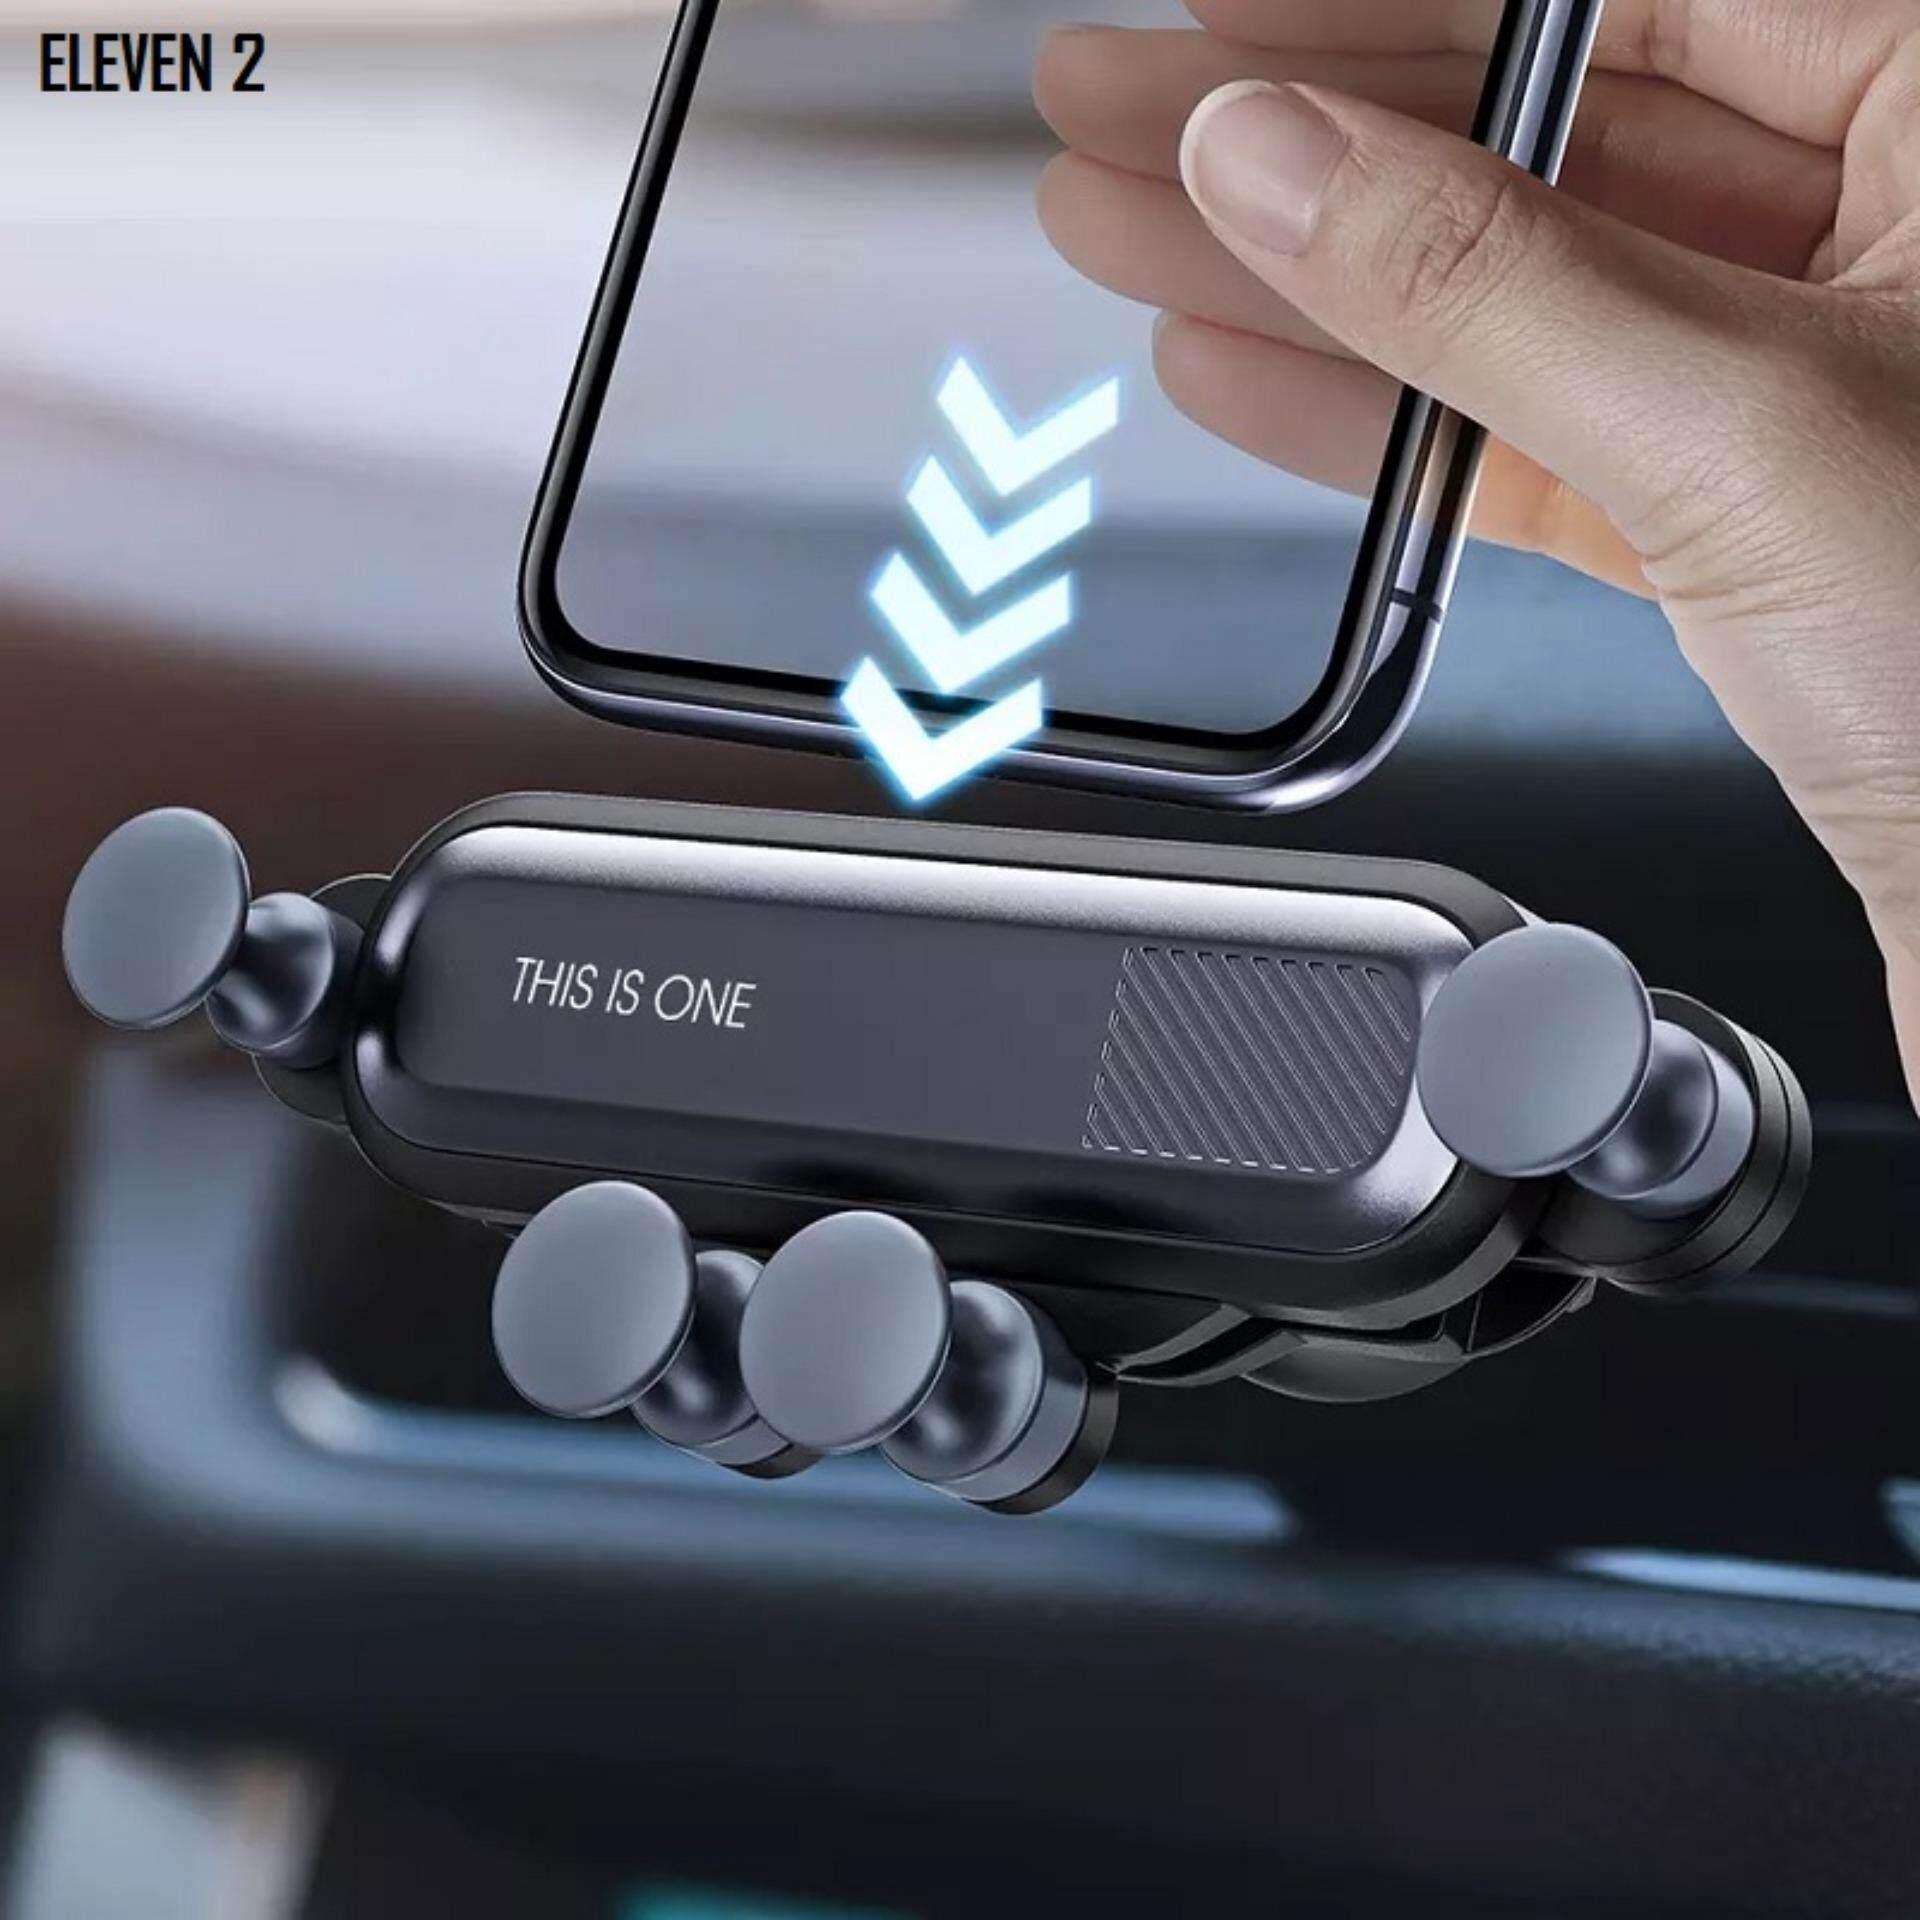 Telefon Bimbit & Tablet - Buy Telefon Bimbit & Tablet at